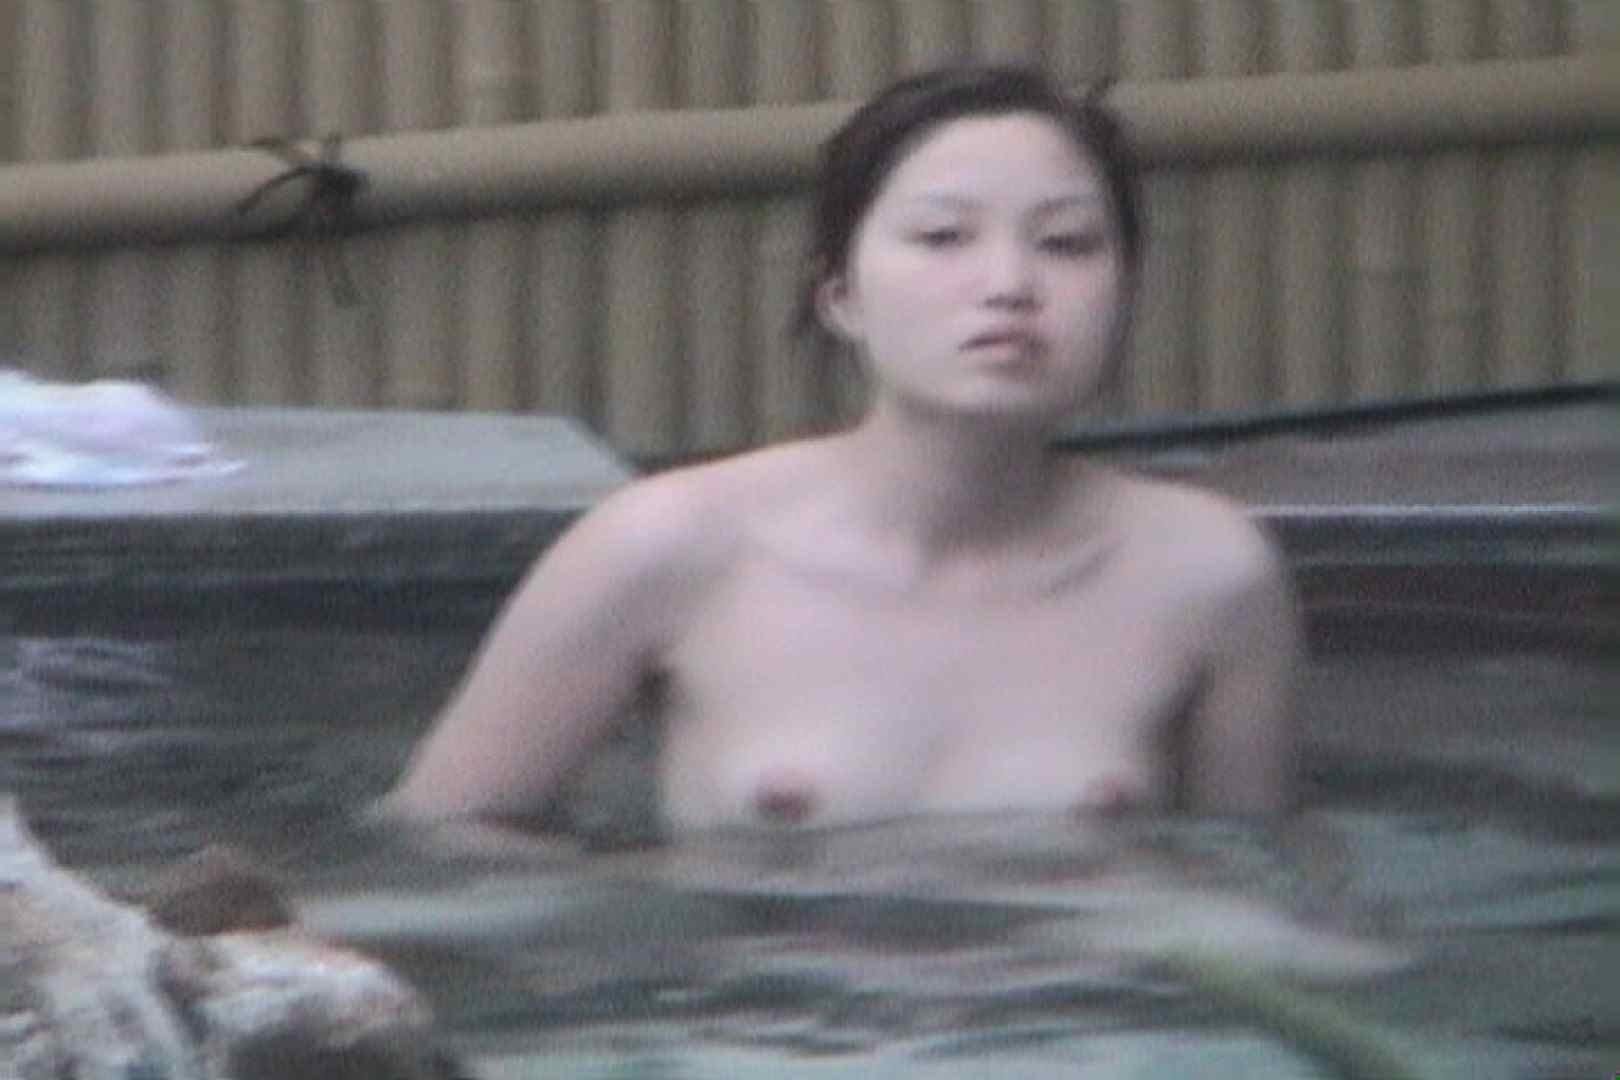 Aquaな露天風呂Vol.602 露天風呂編  83PIX 44